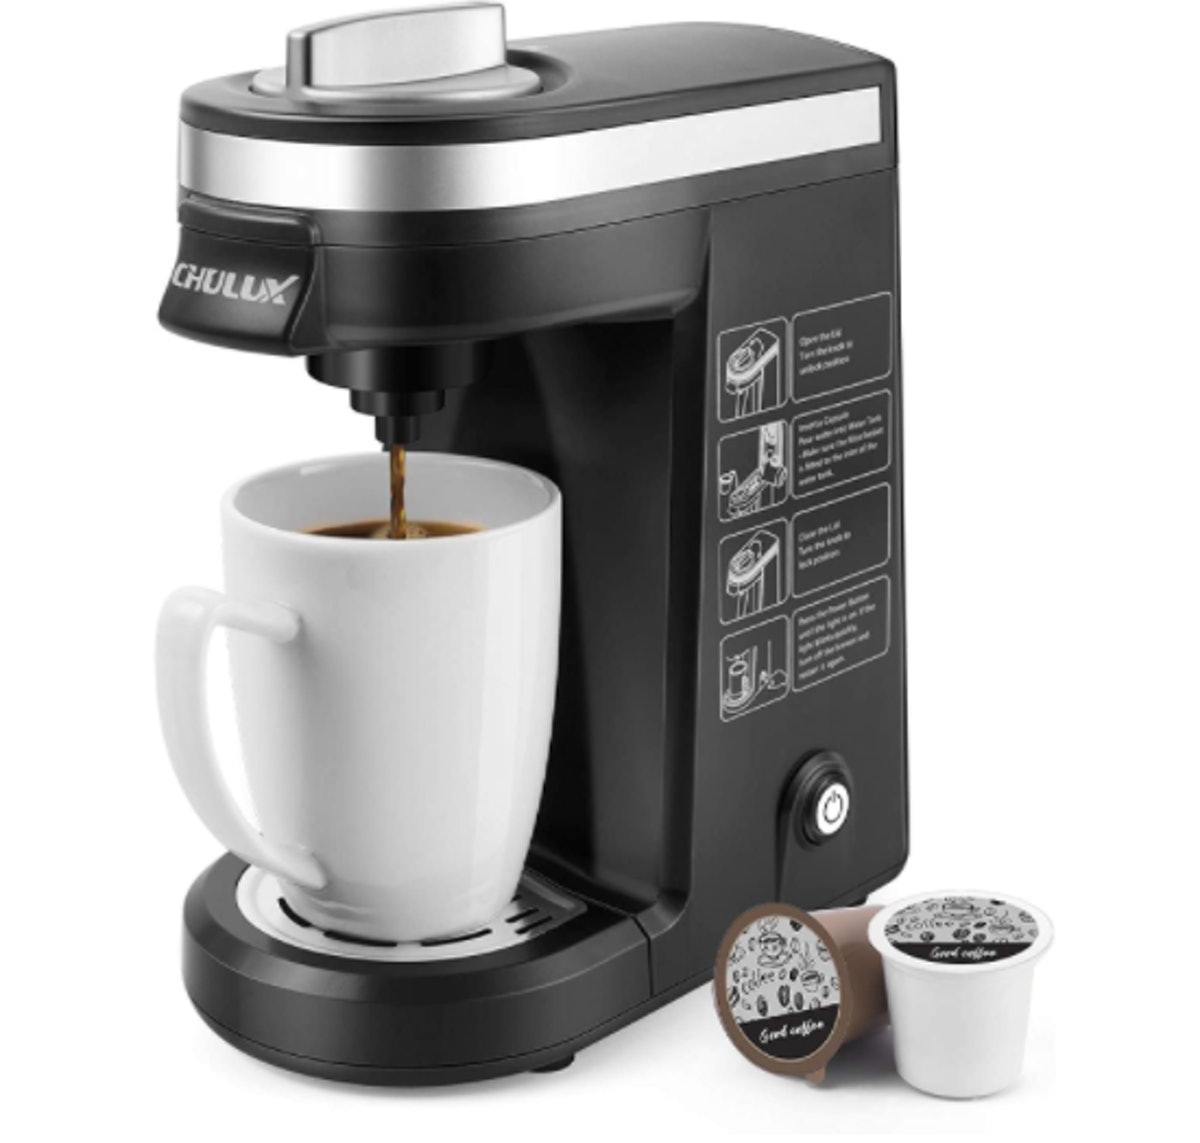 CHULUX Single-Serve Coffee Brewer